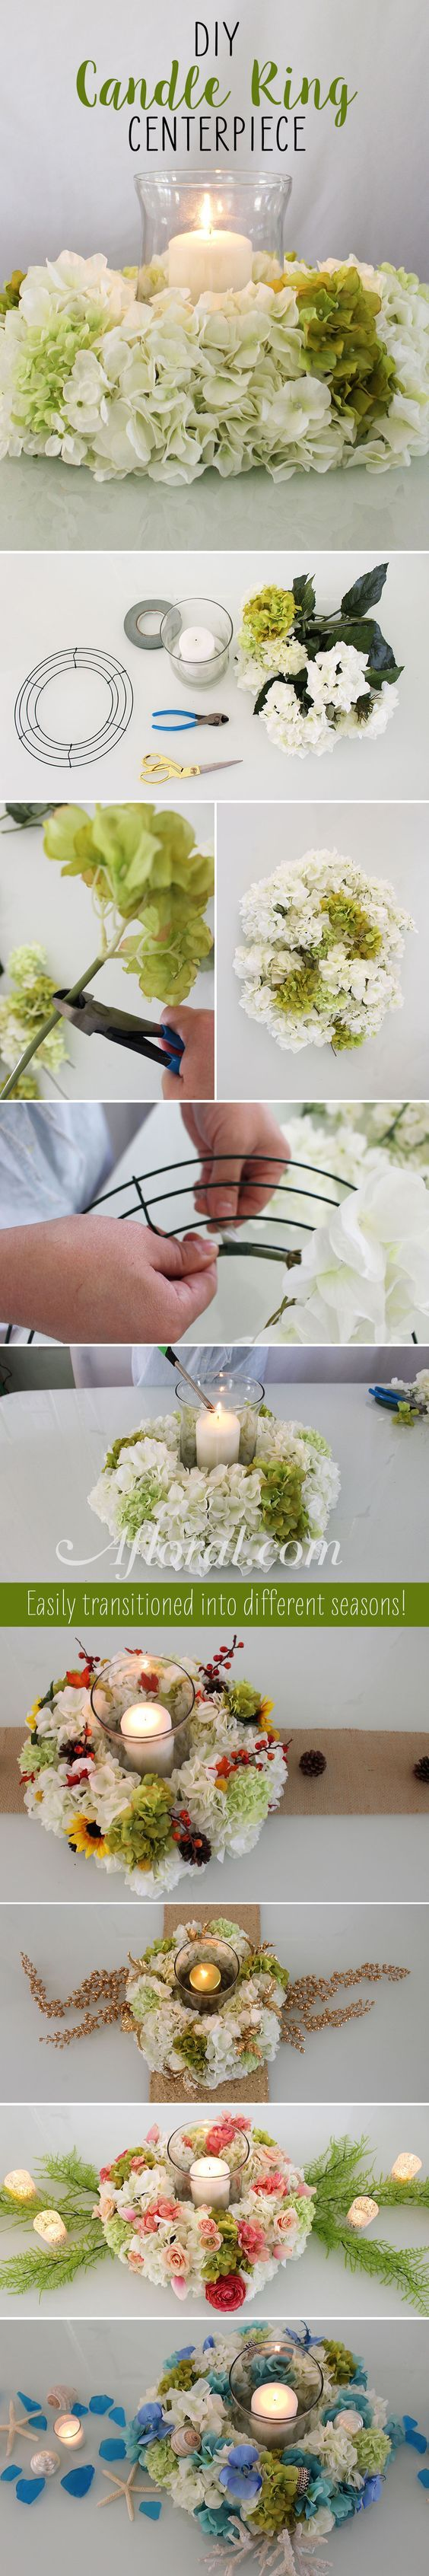 DIY Hydrangea Candle Ring Centerpiece